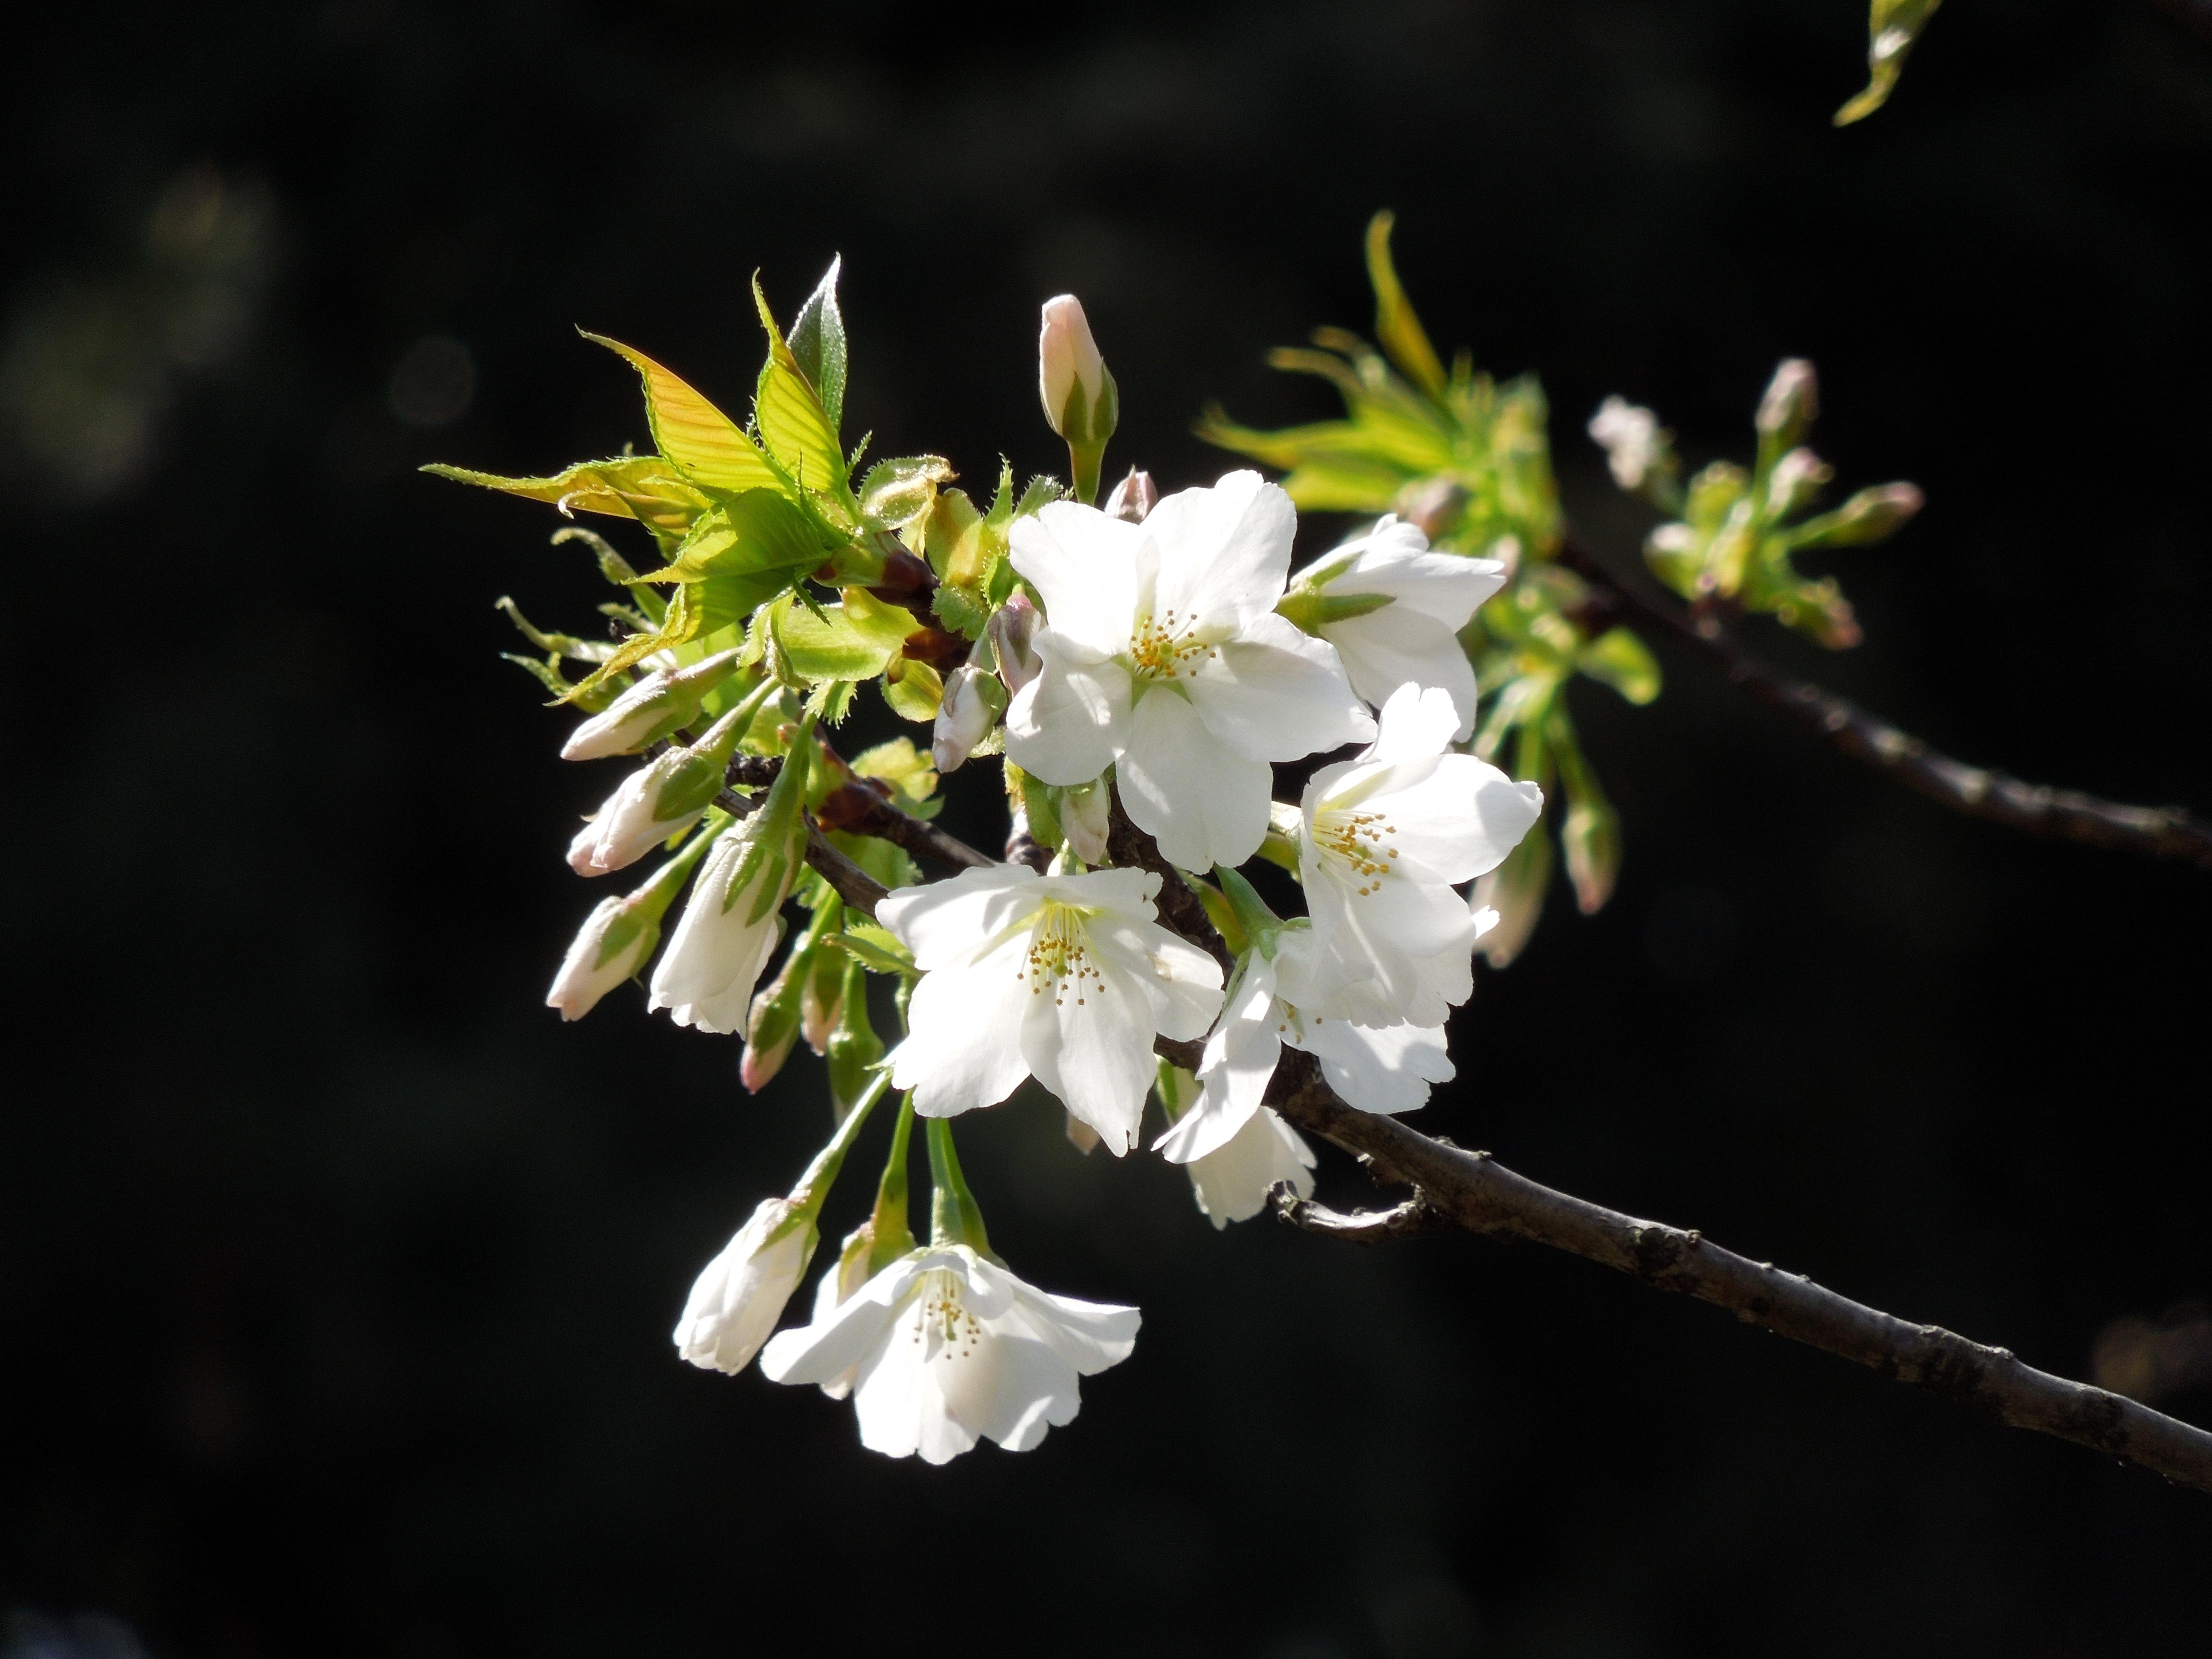 Free Images Landscape Nature Branch Blossom White Fruit